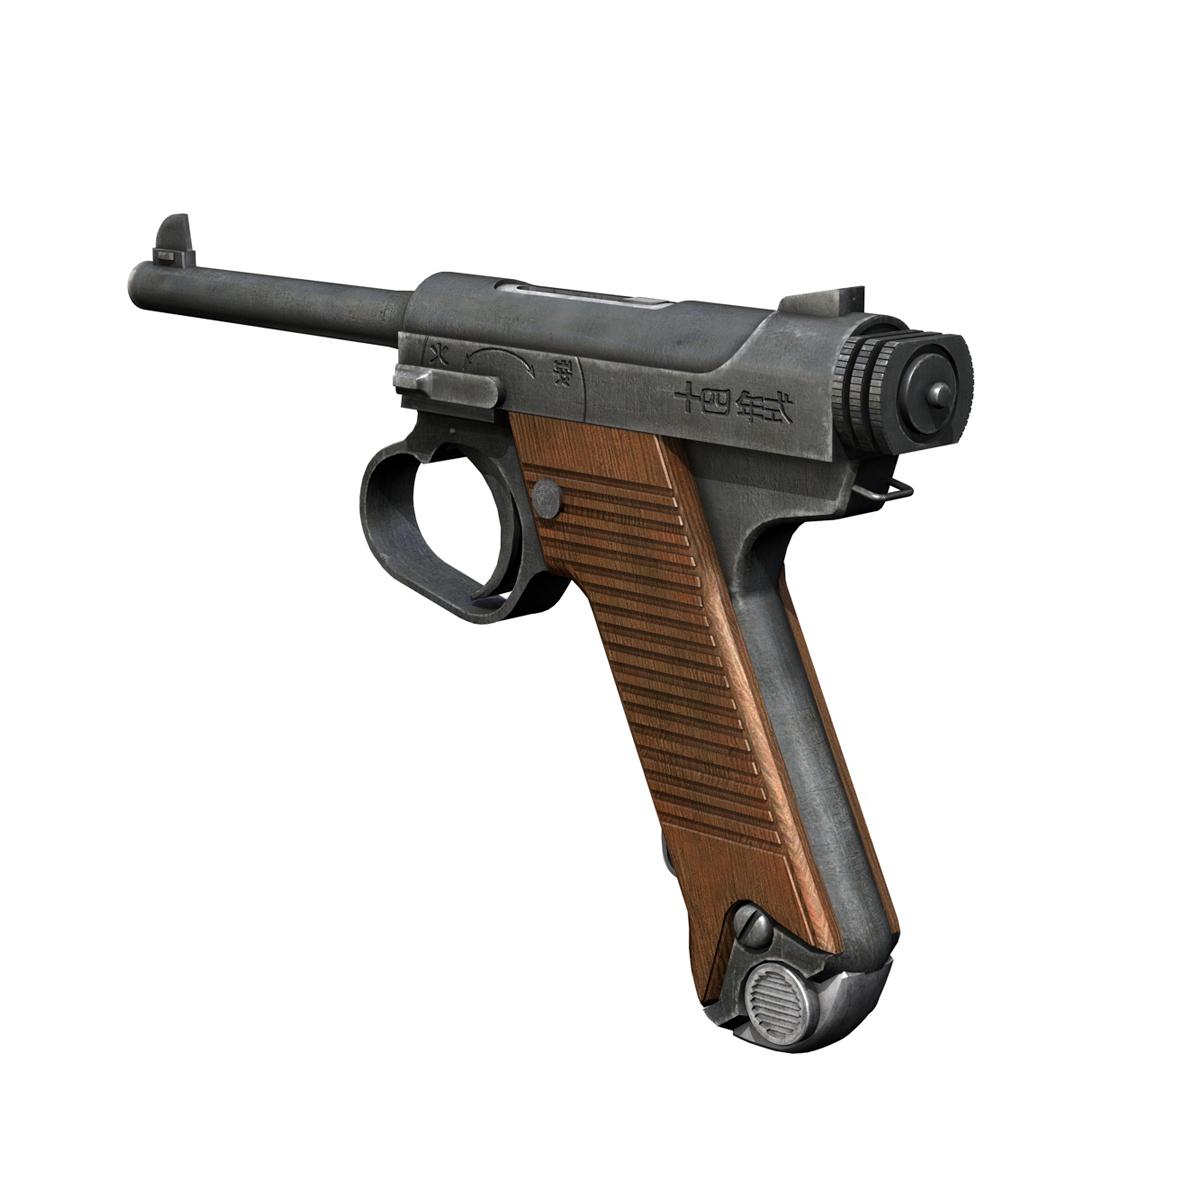 Nambu pištolj tip 14 3d model 3ds fbx c4d lwo obj 195156